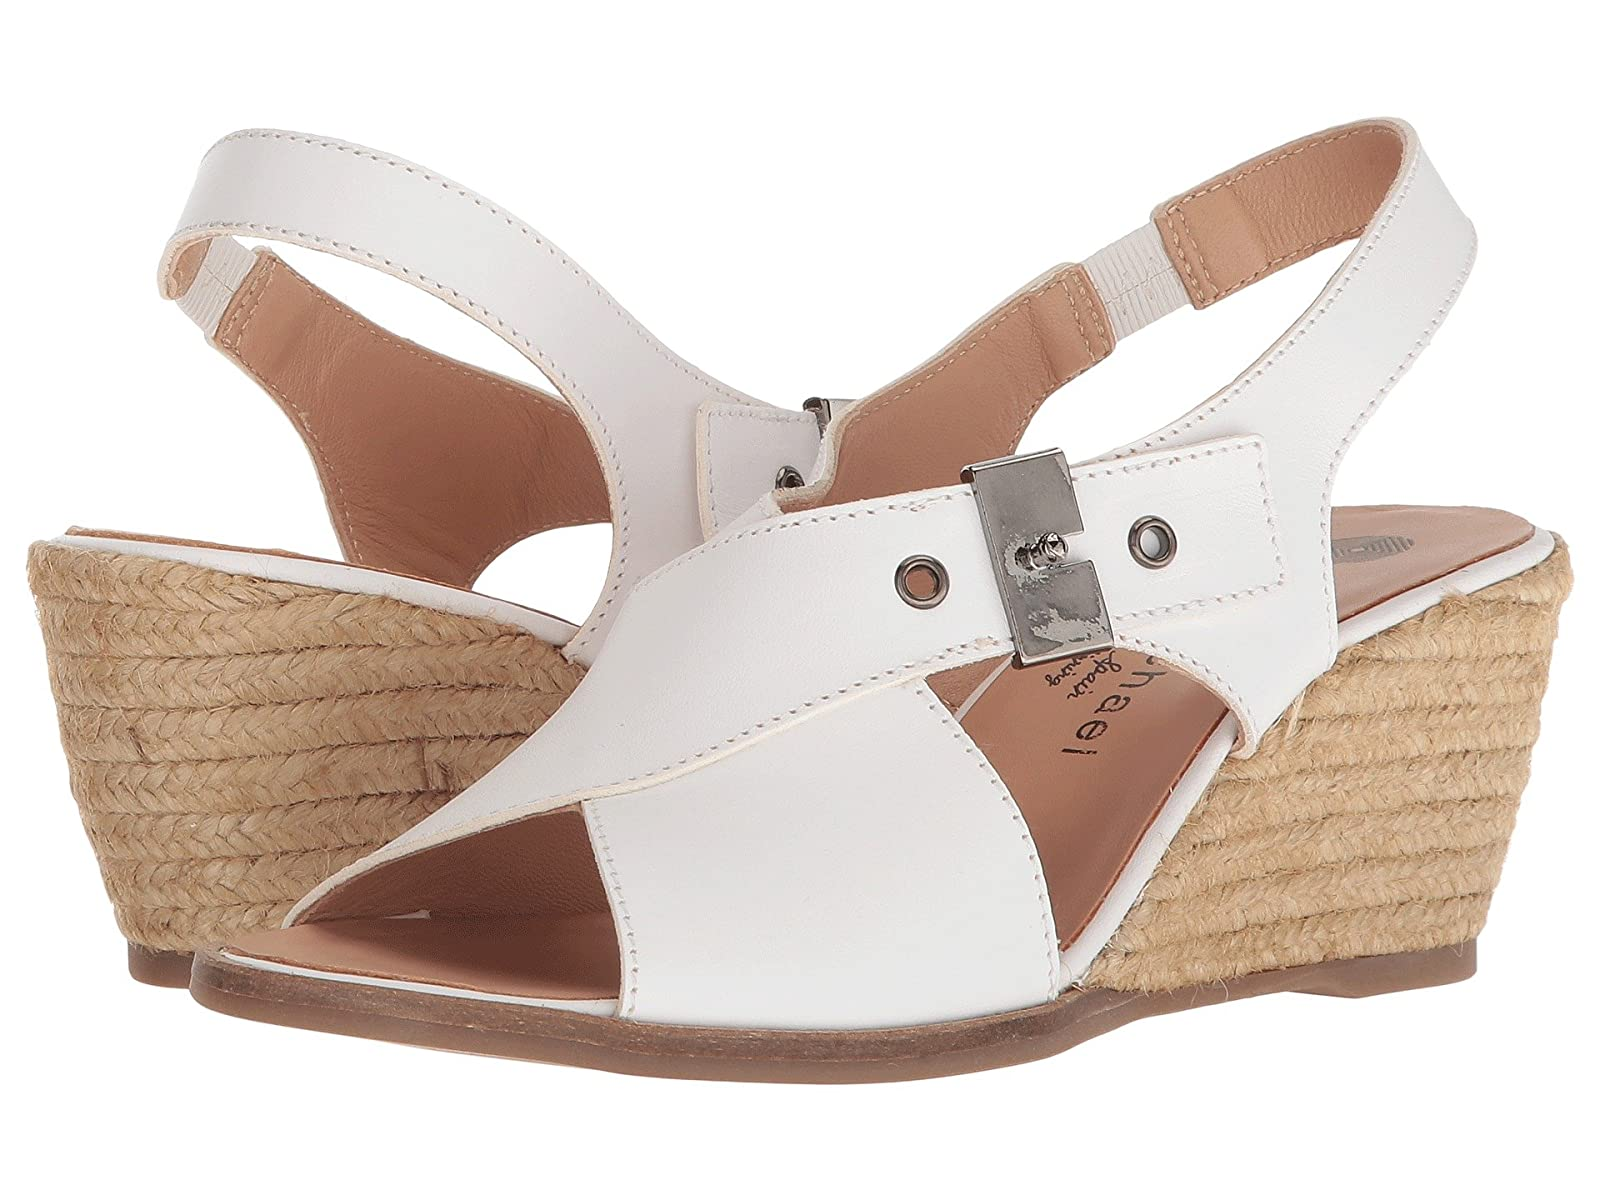 Eric Michael VenturaCheap and distinctive eye-catching shoes